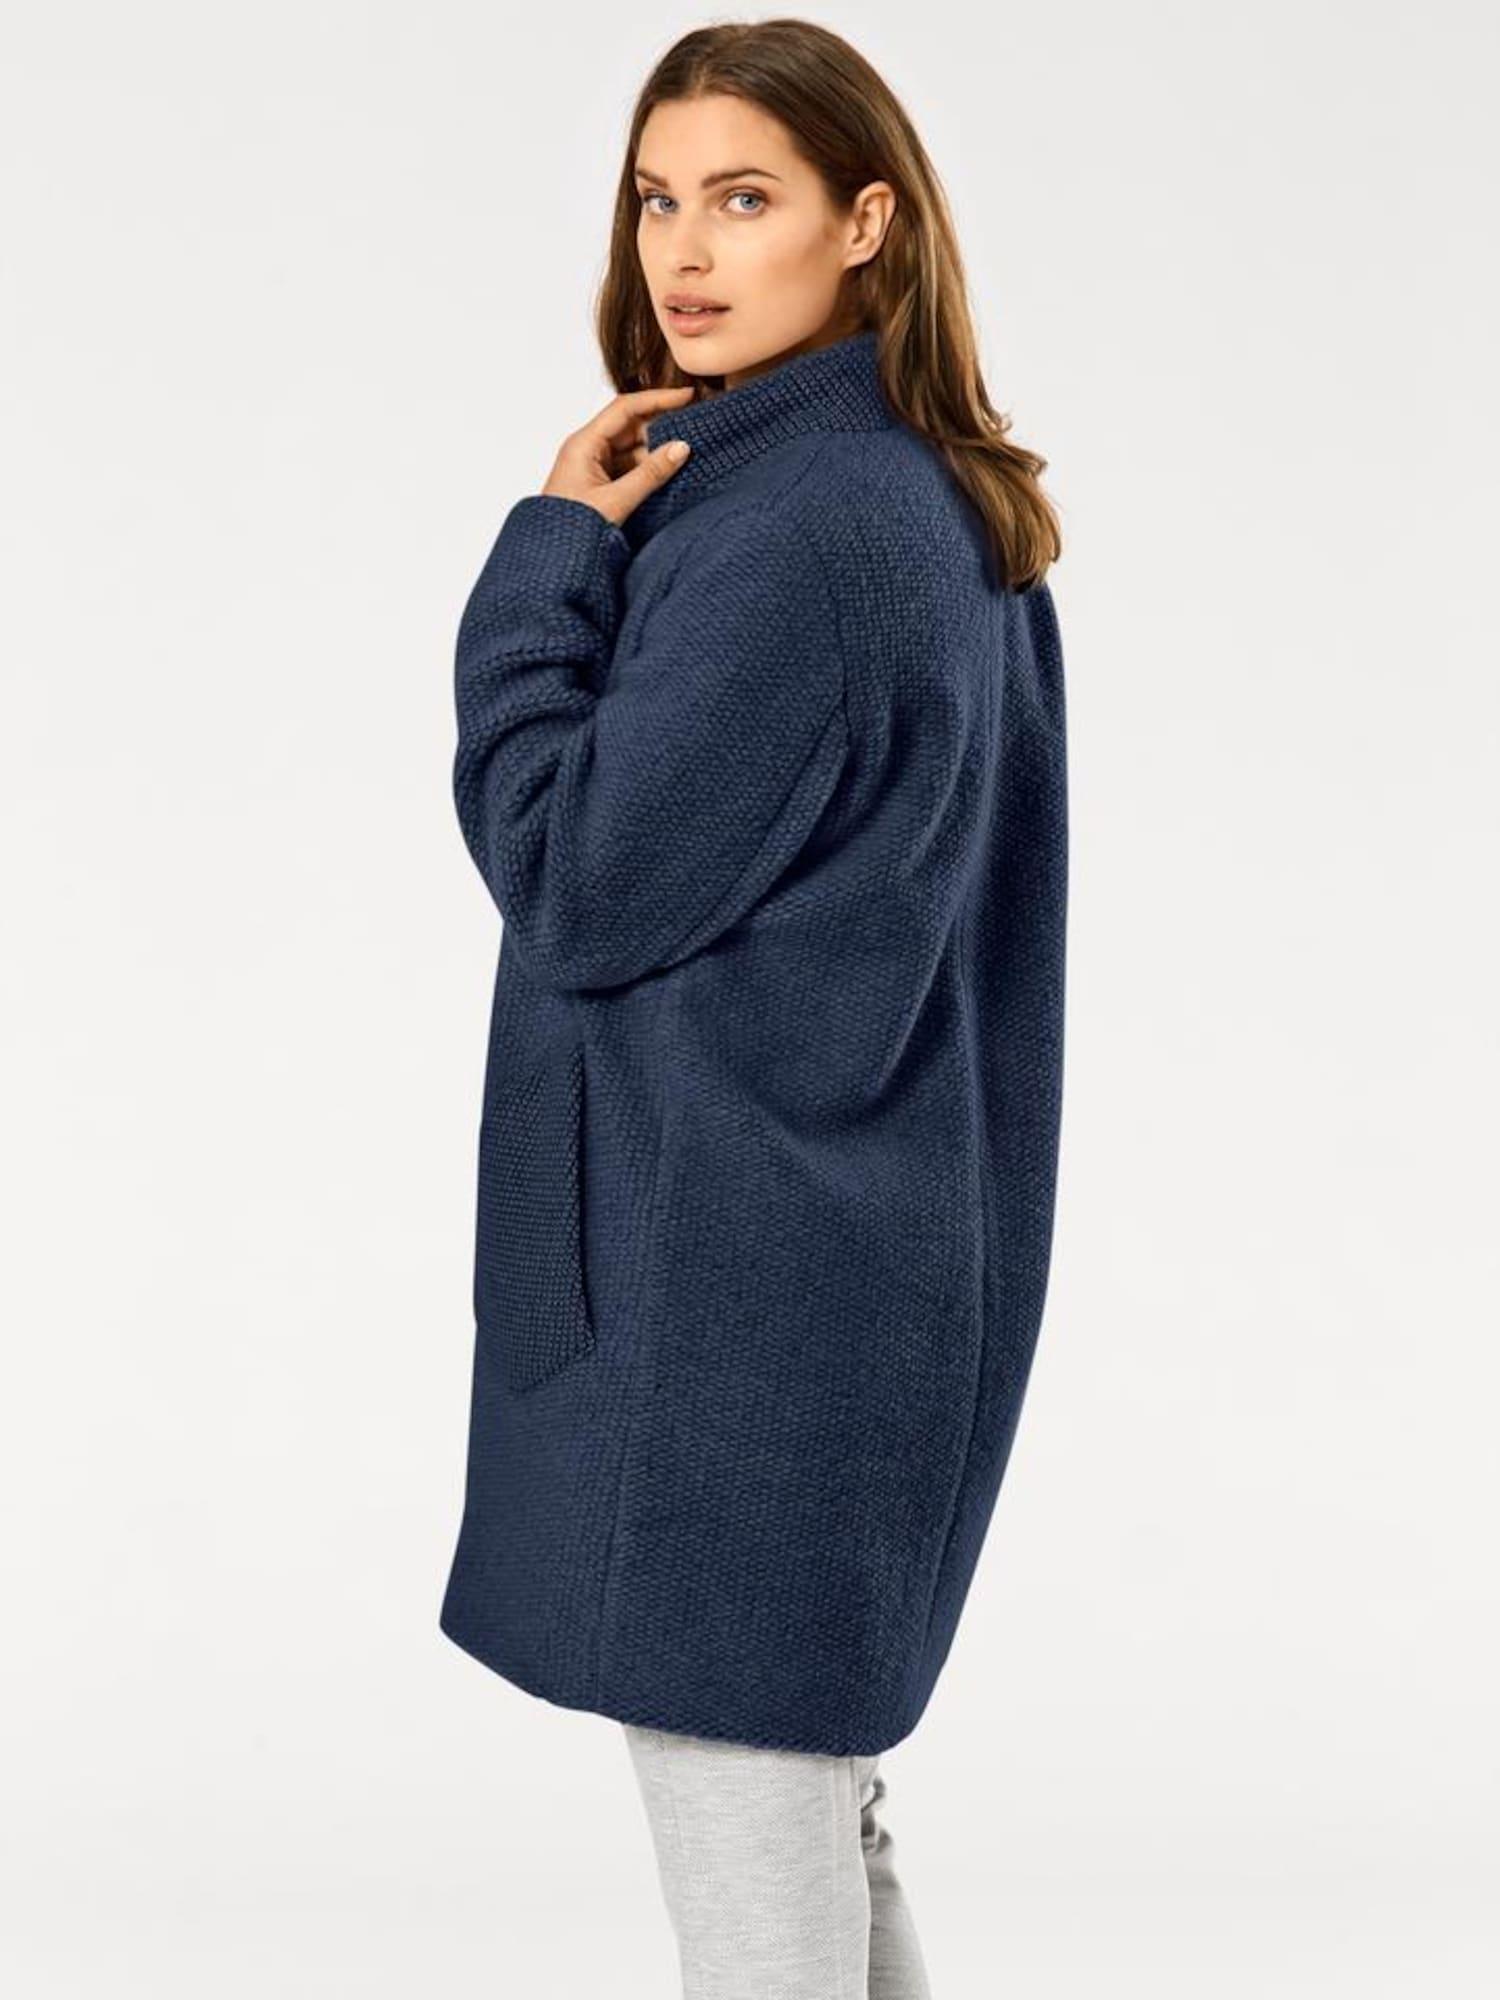 heine Demisezoninis paltas tamsiai mėlyna jūros spalva